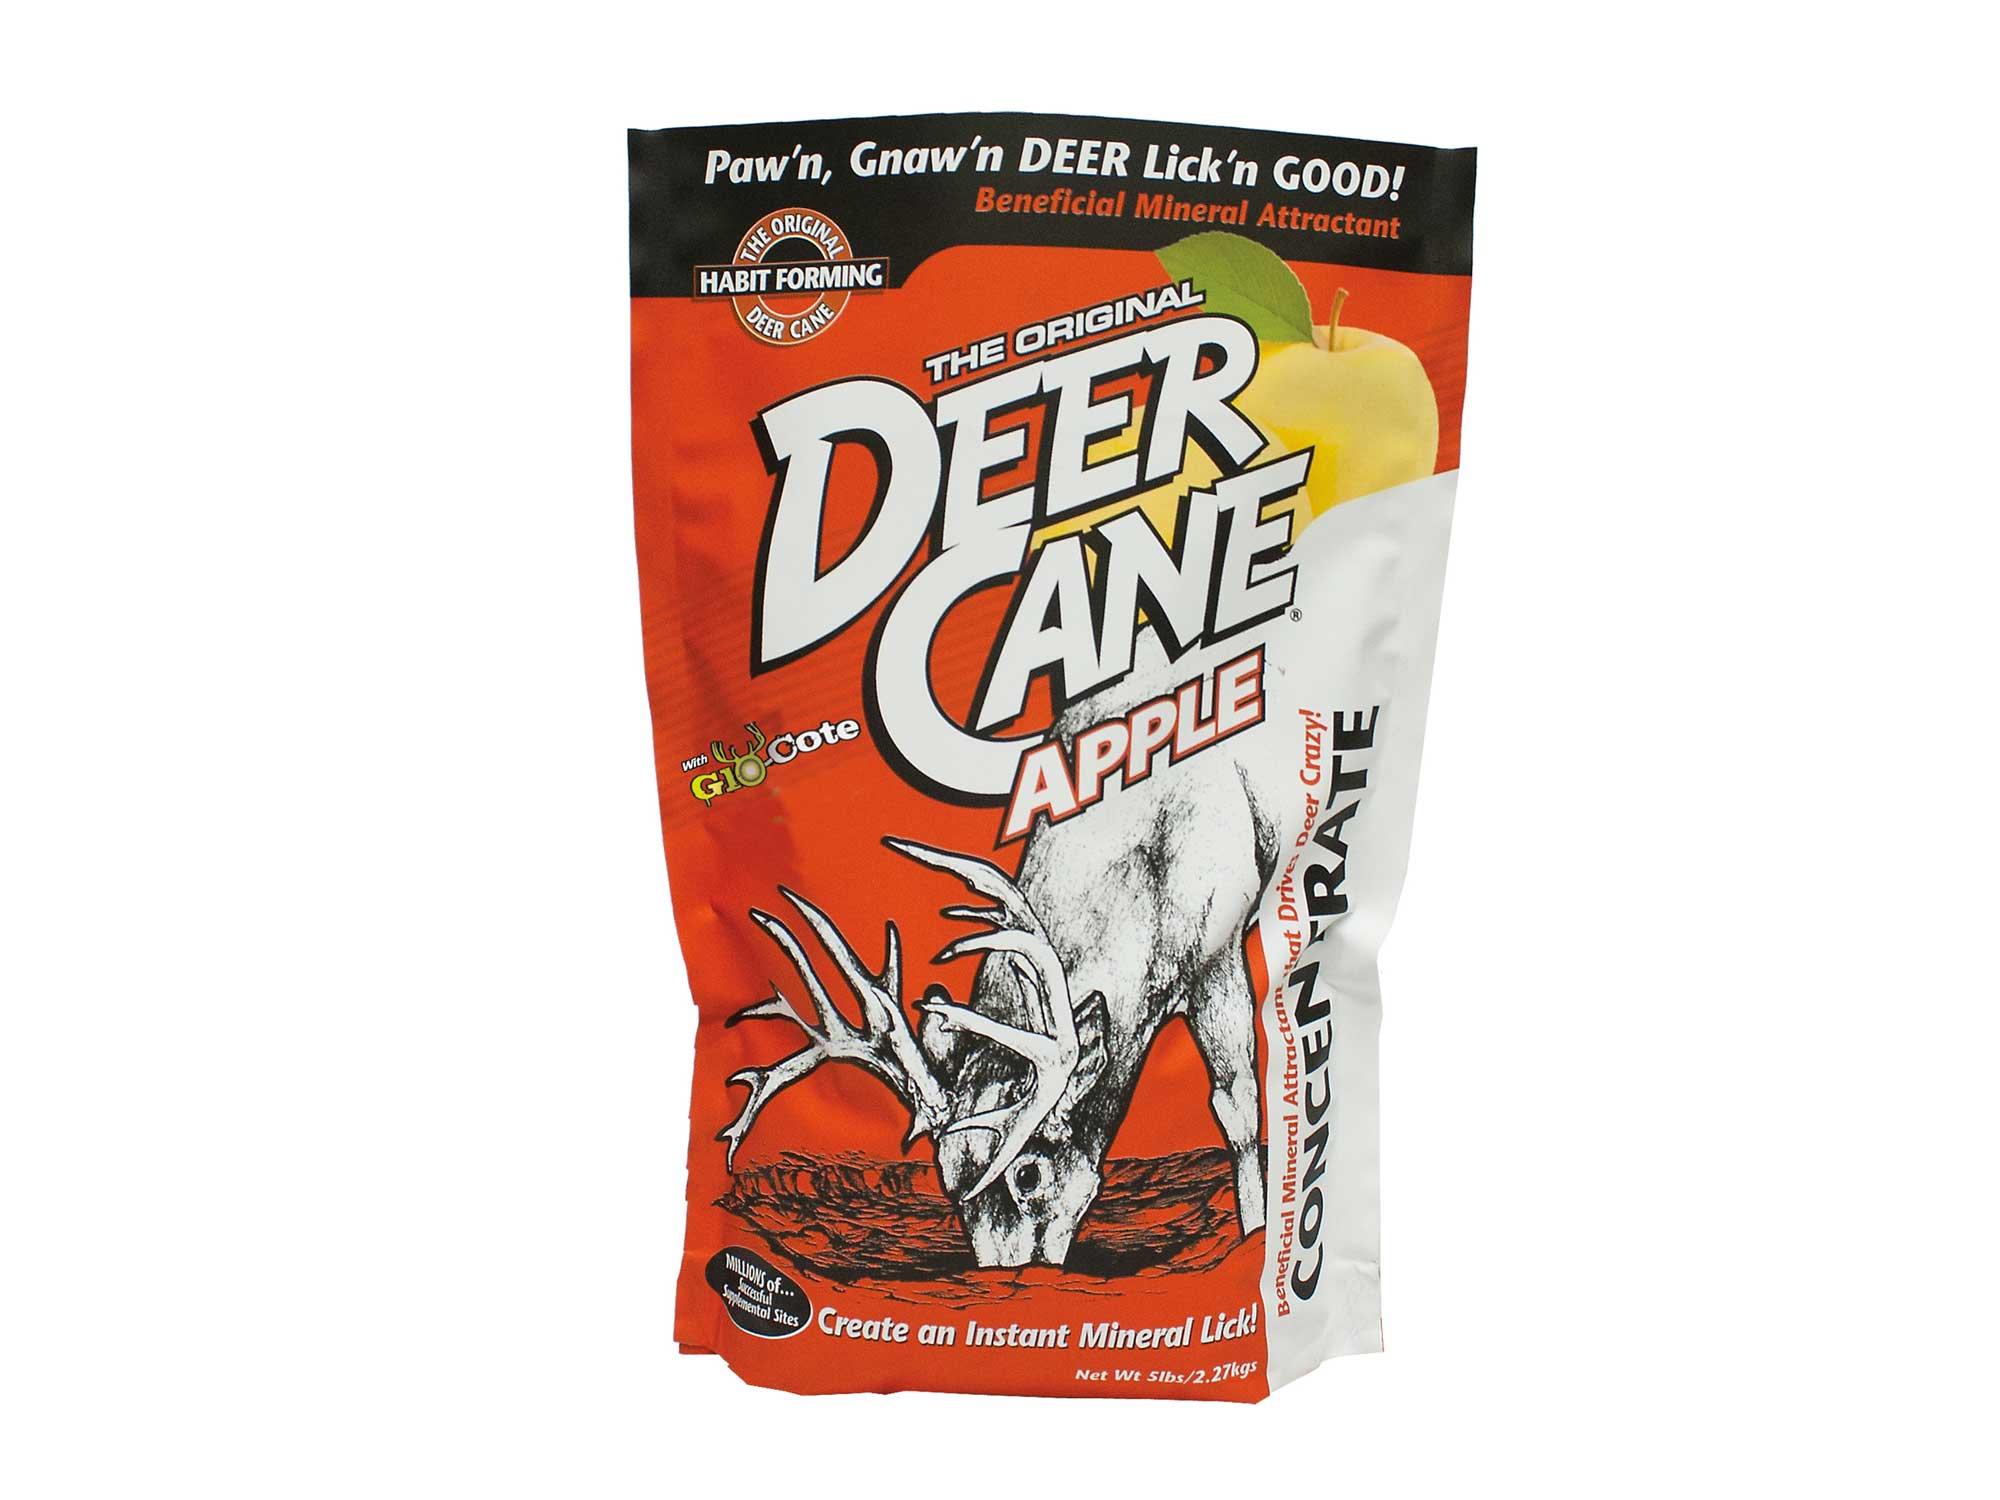 Apple-flavored Deer Cane powder